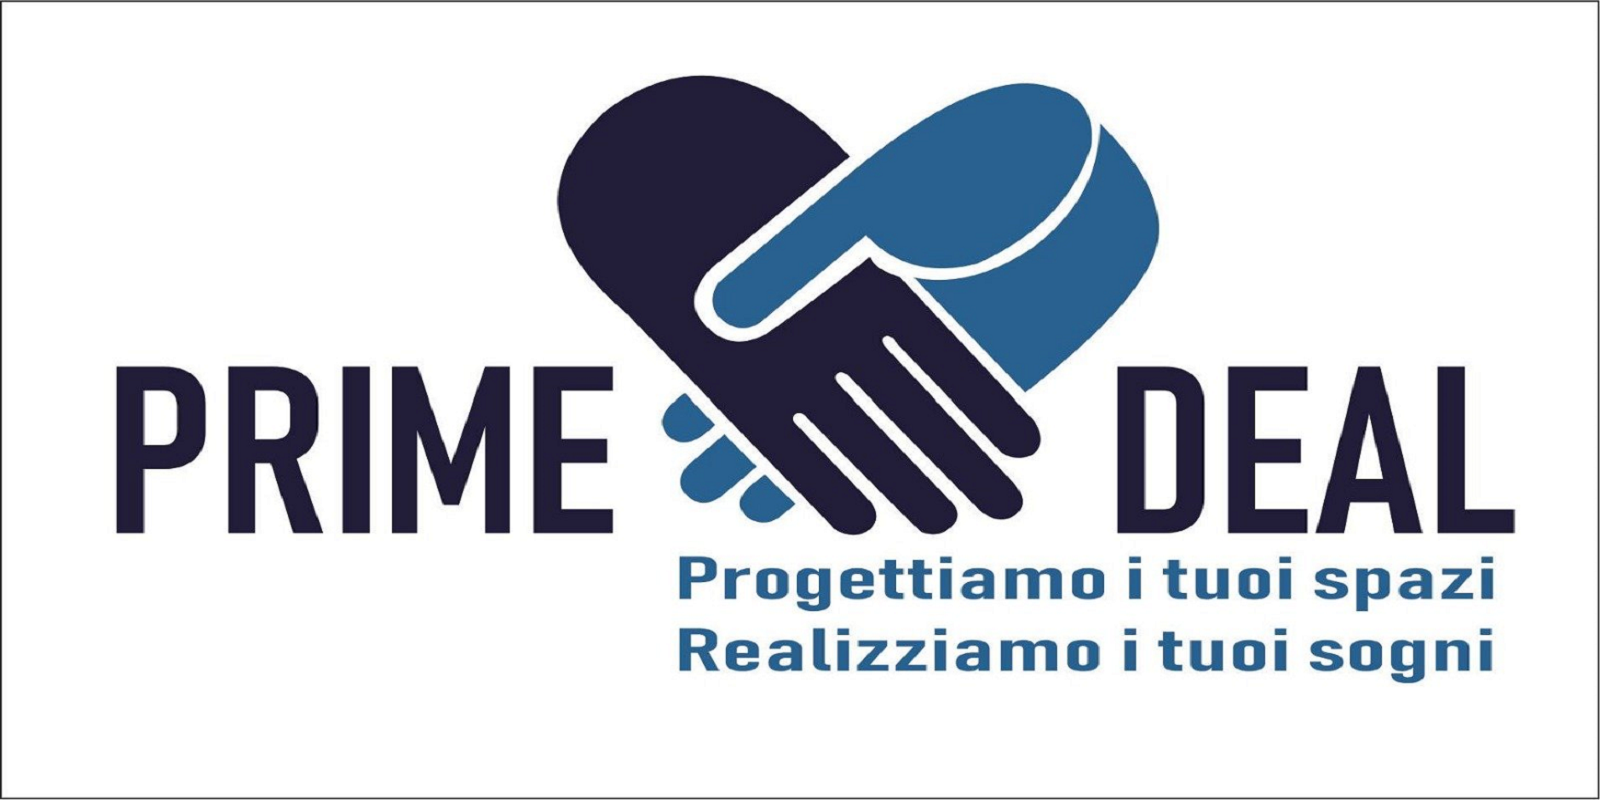 Finestre in pvc roma qfort store prime deal srls